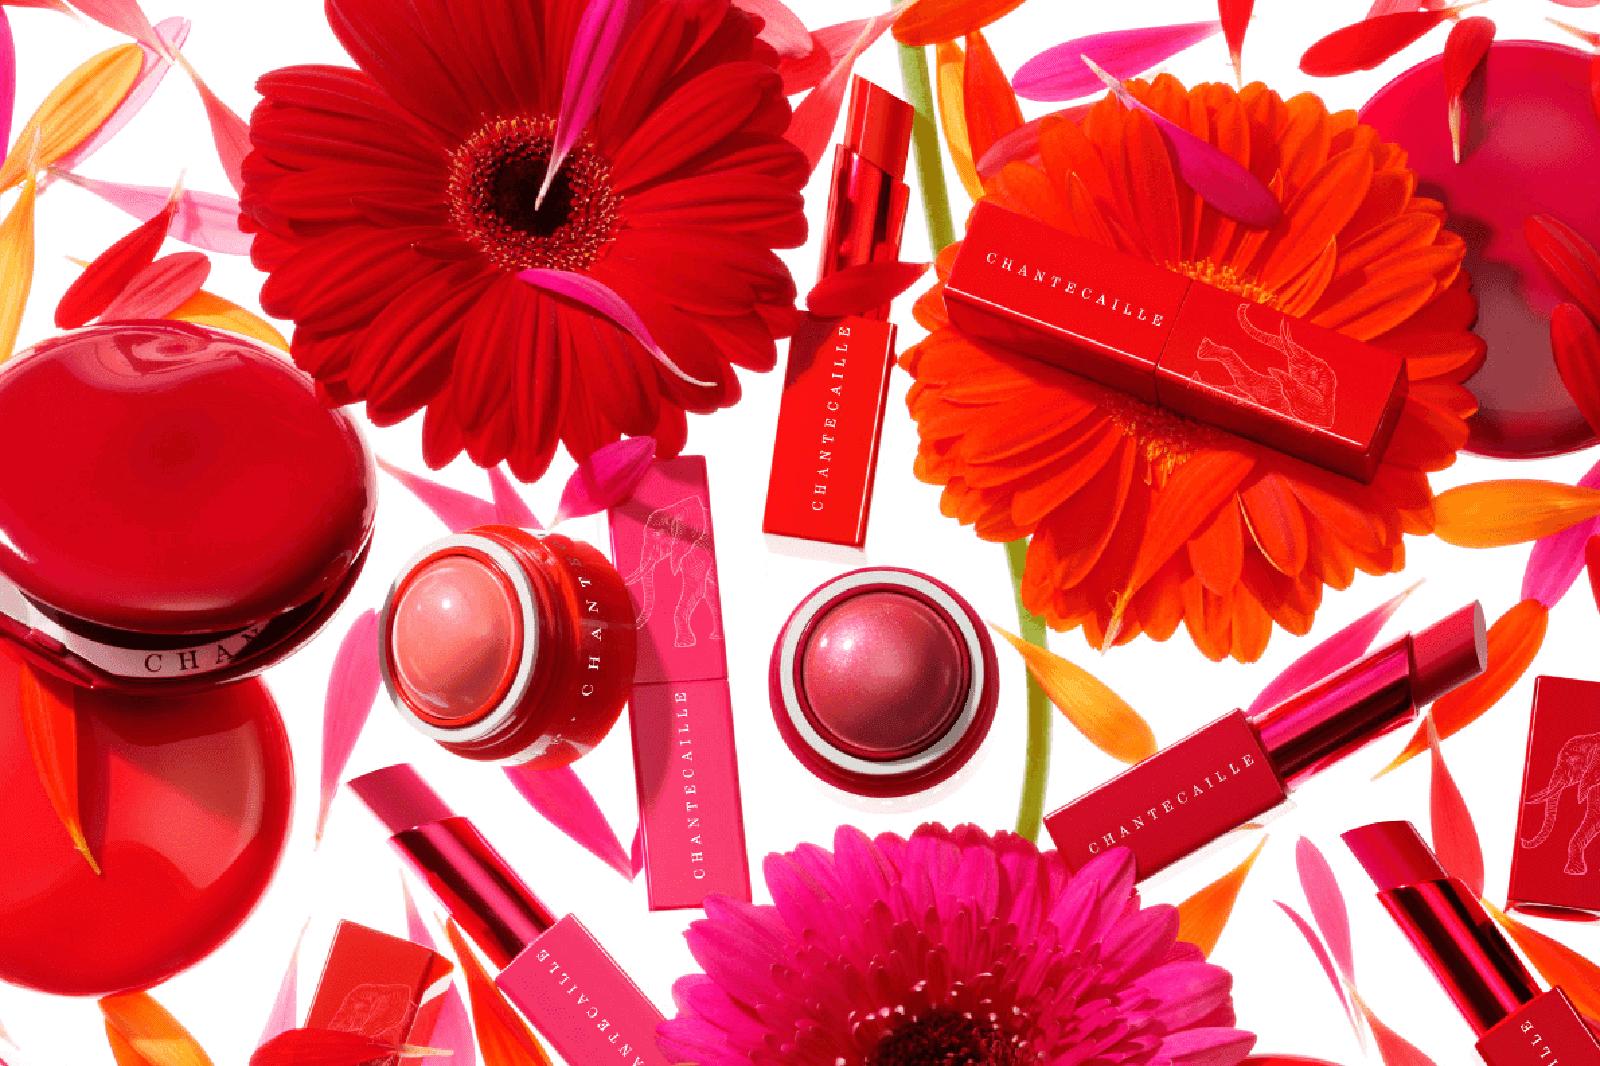 chantecaille super blloms collection maquillage ete 2019